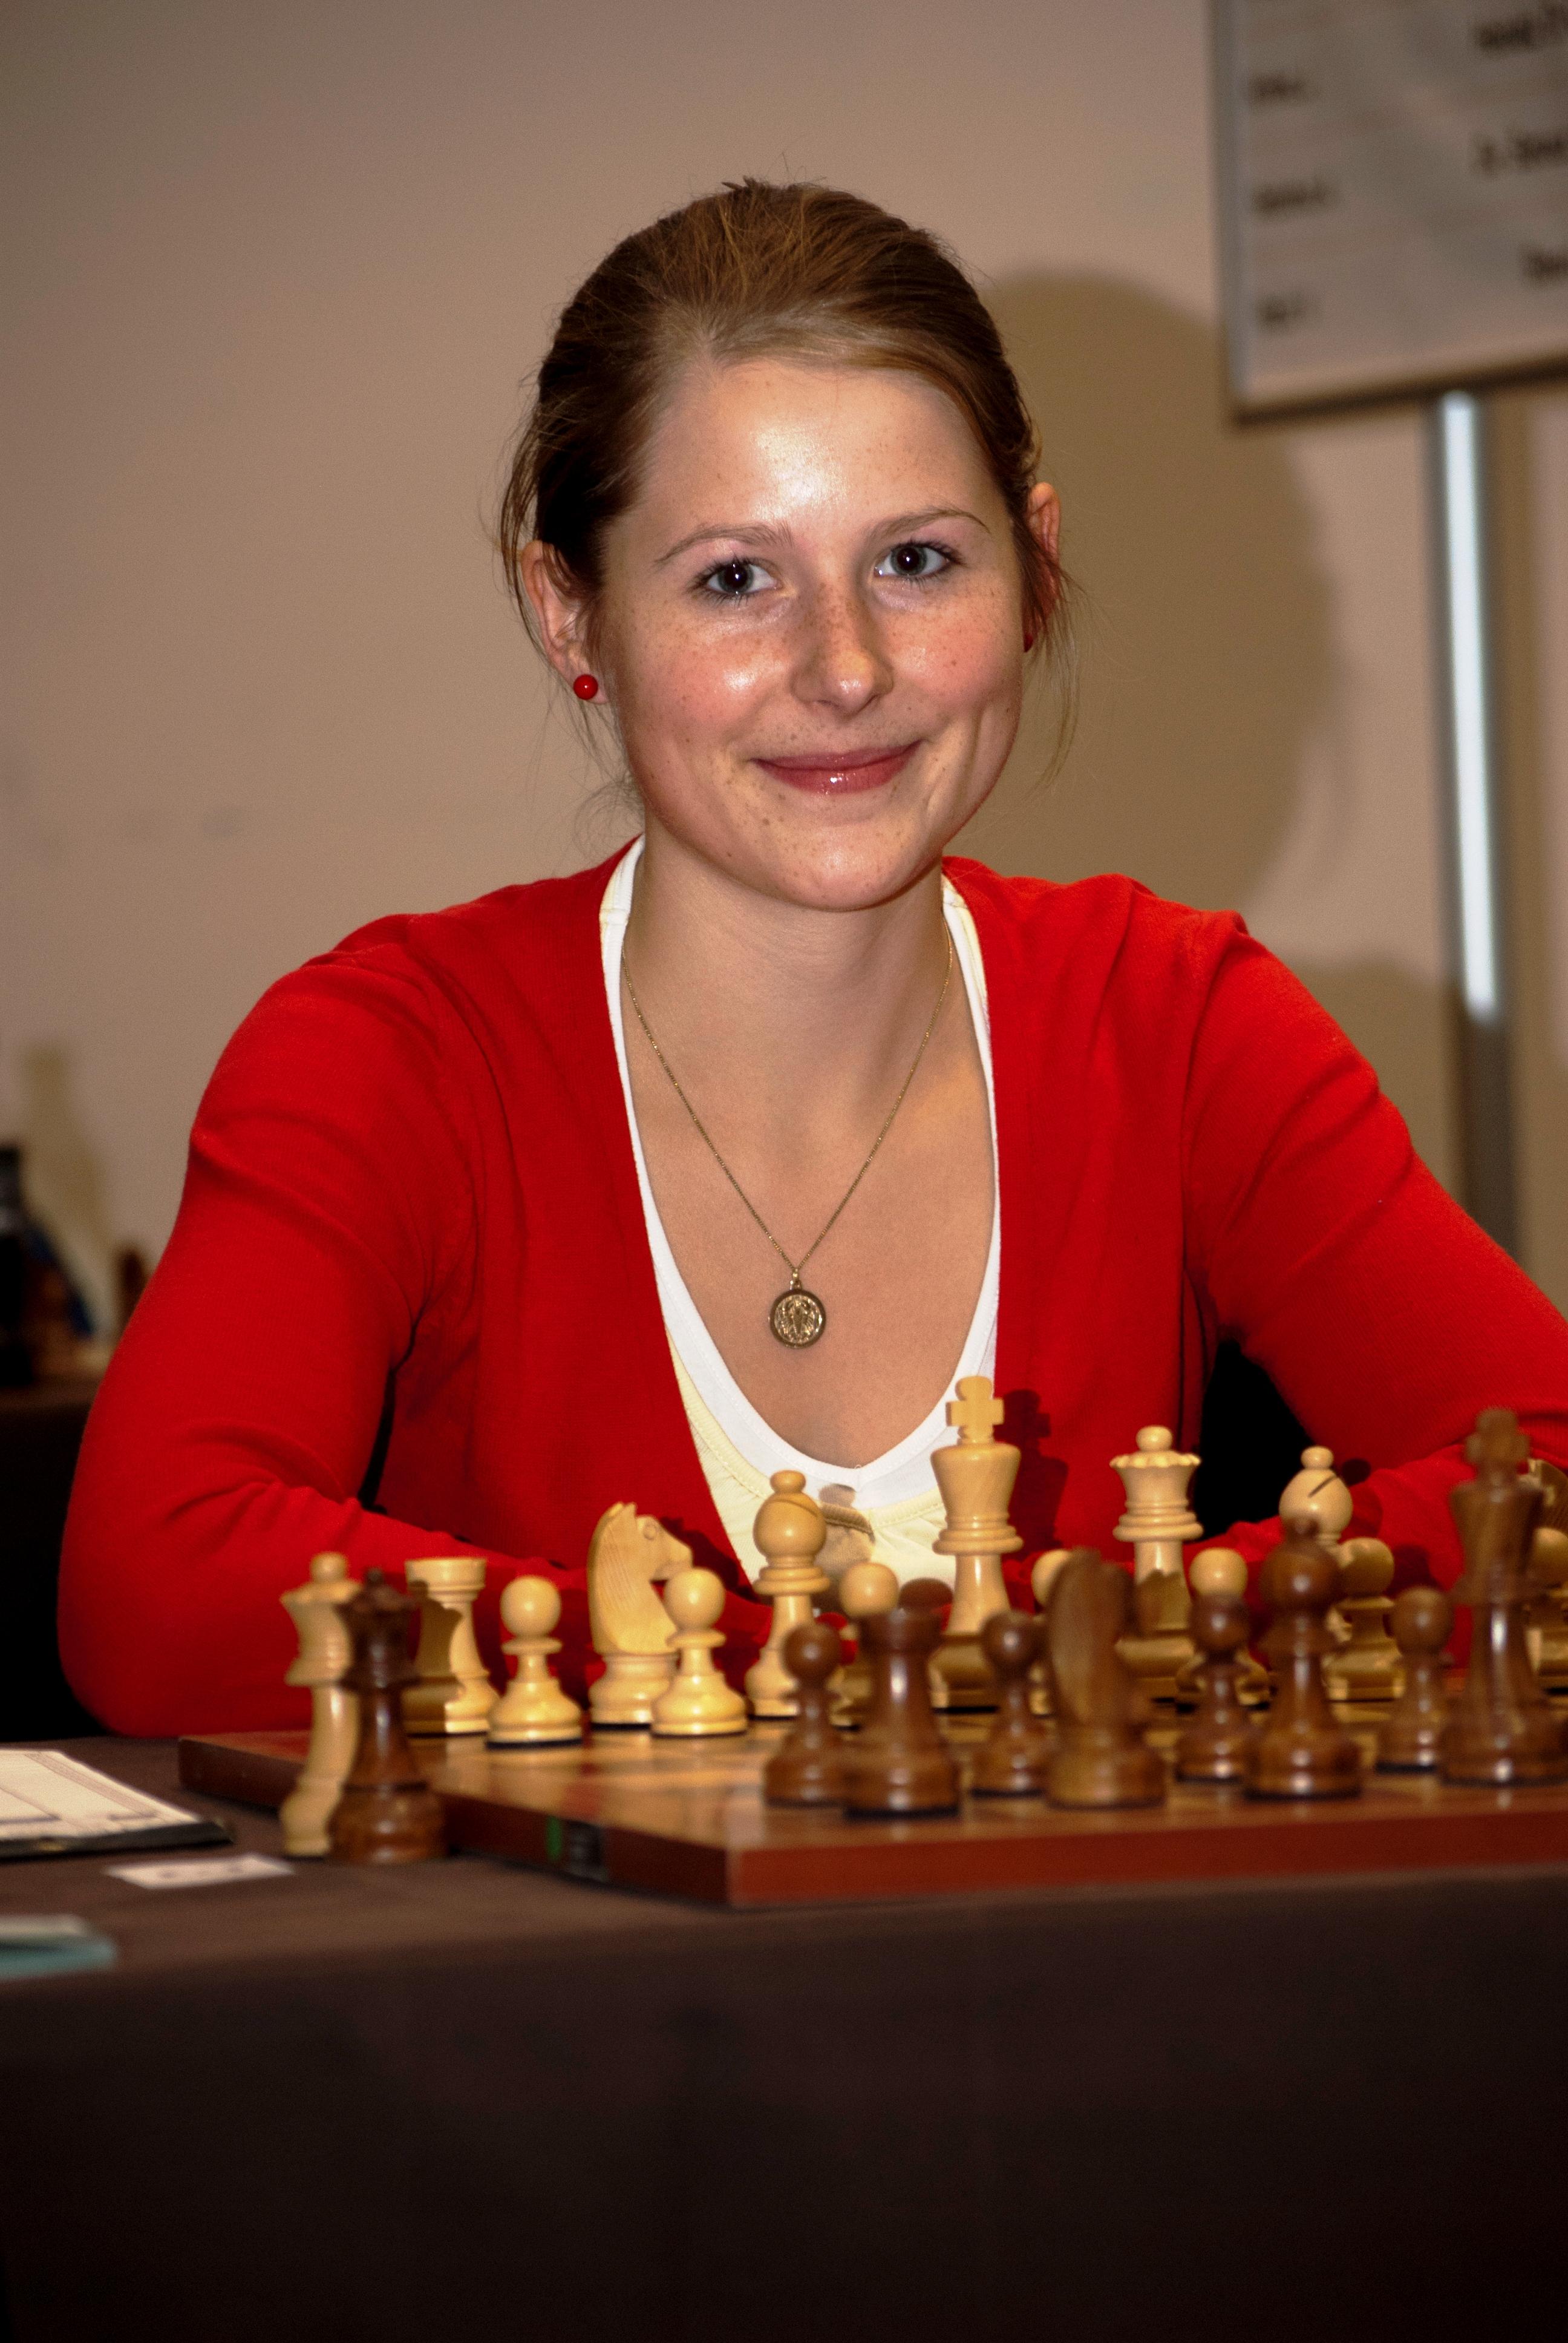 File:Melanie Ohme 2011.jpg - Wikimedia Commons